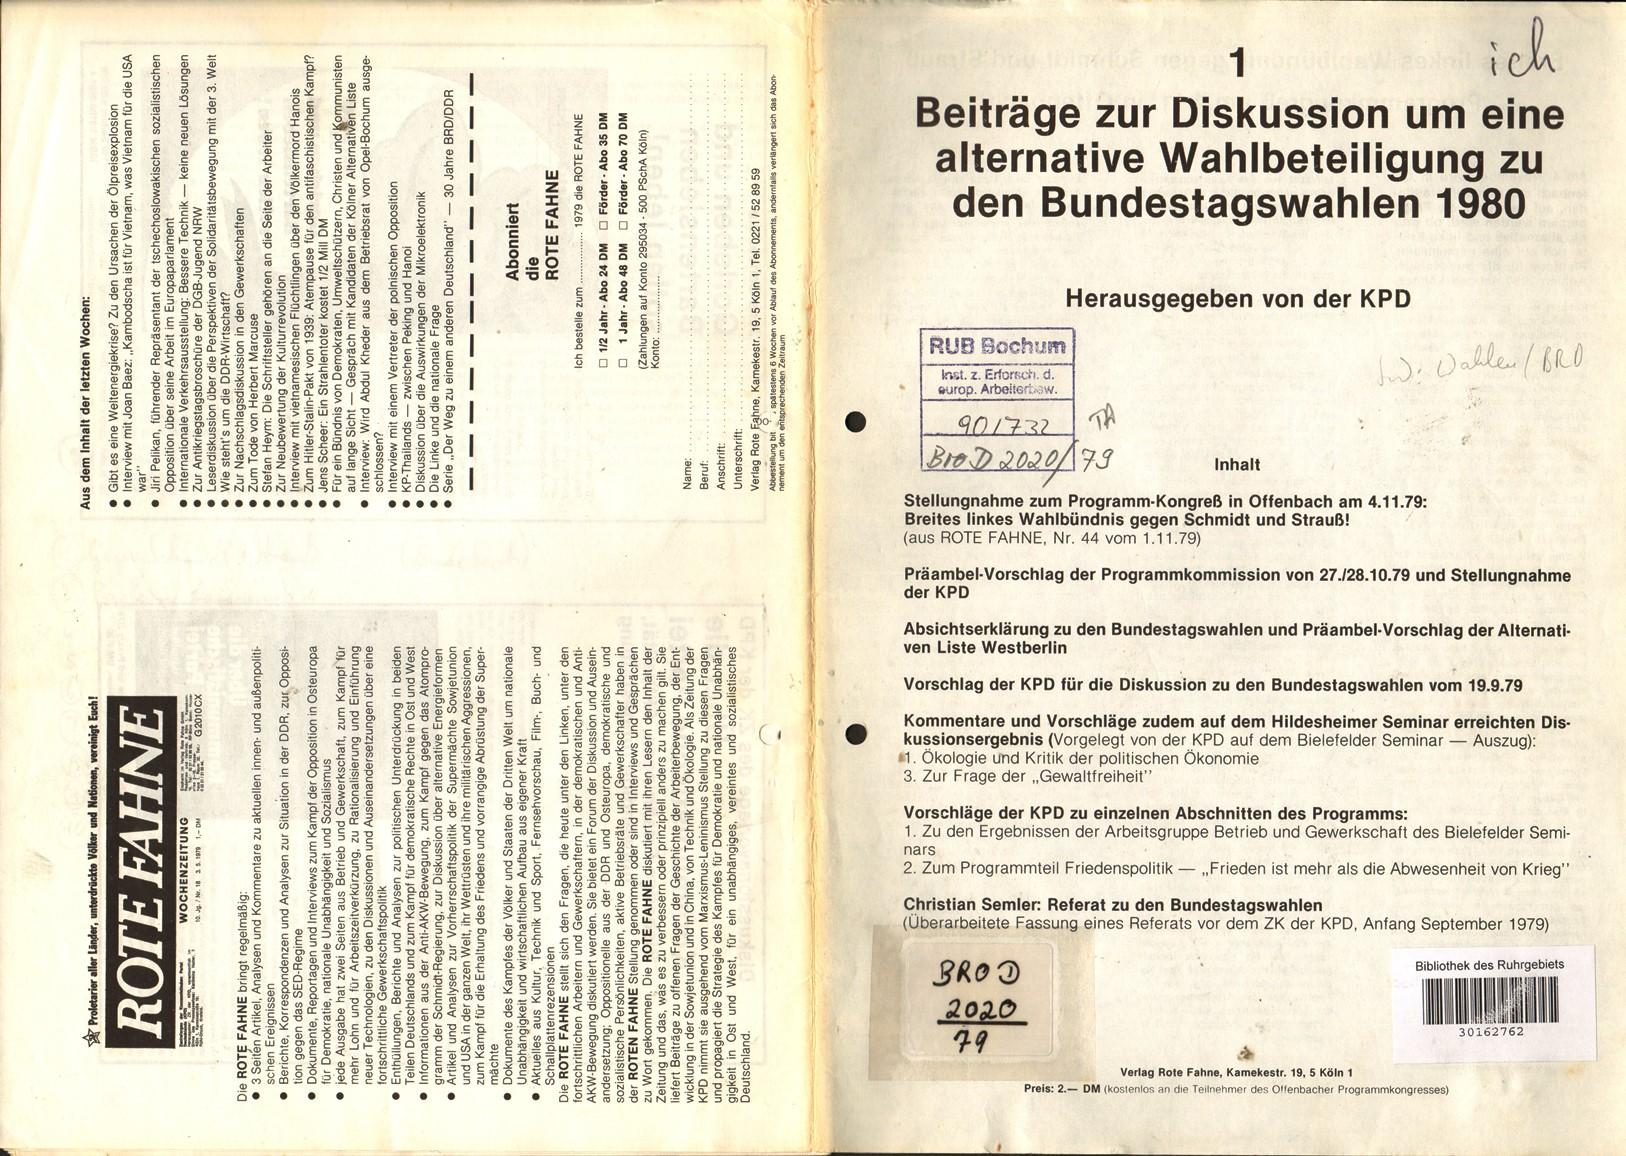 KPDAO_1979_Diskussion_Bundestagswahlen_1980_01